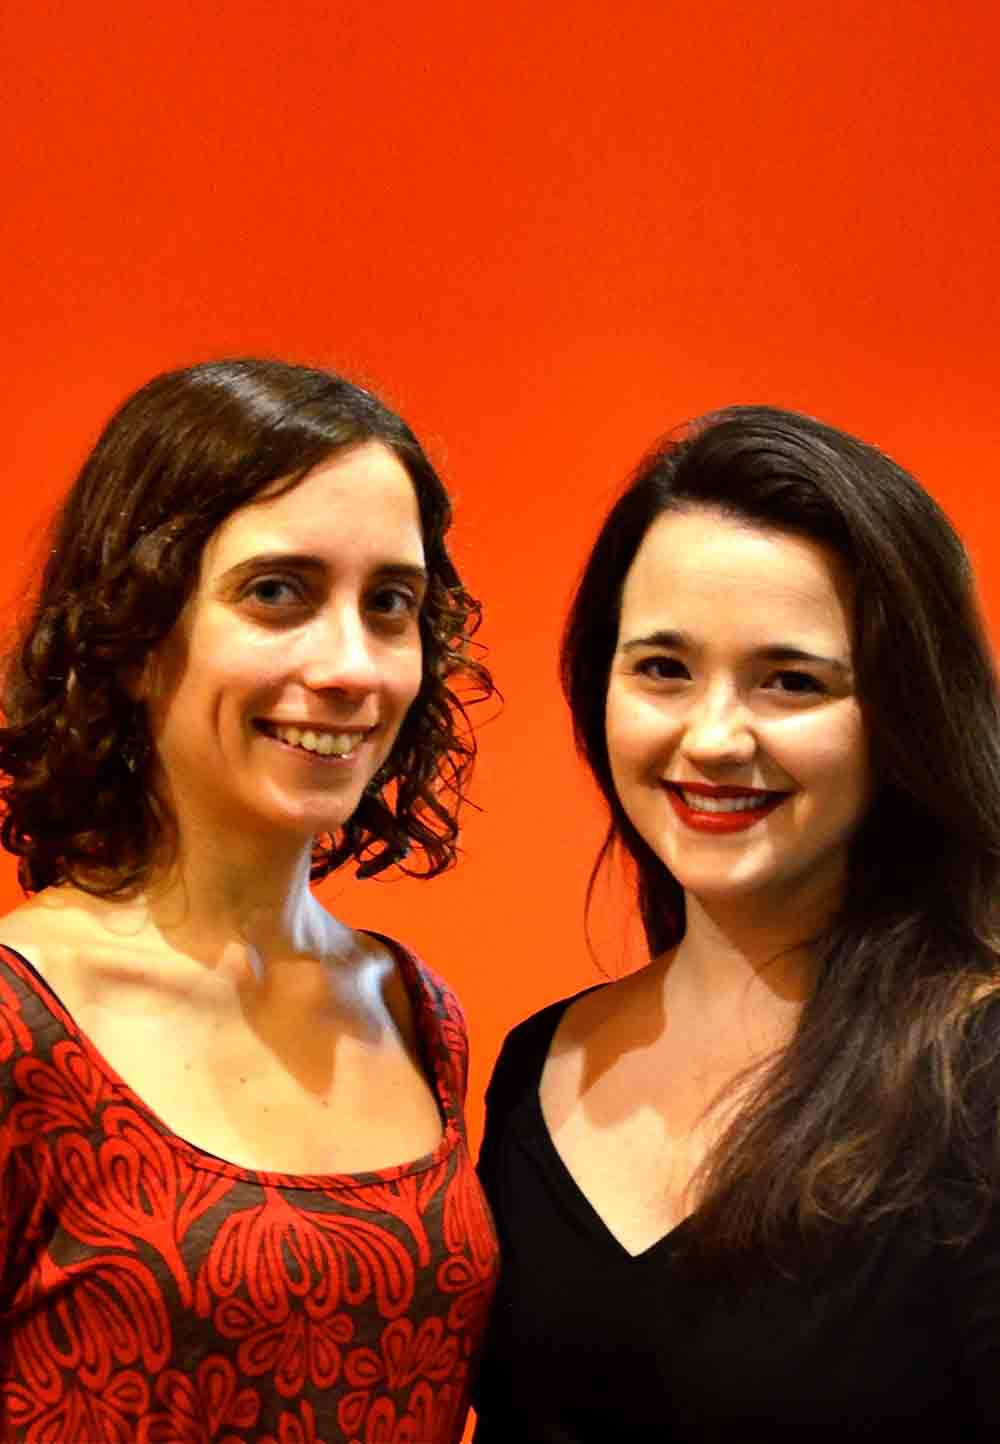 Maria Camahort & Laura Ruhi